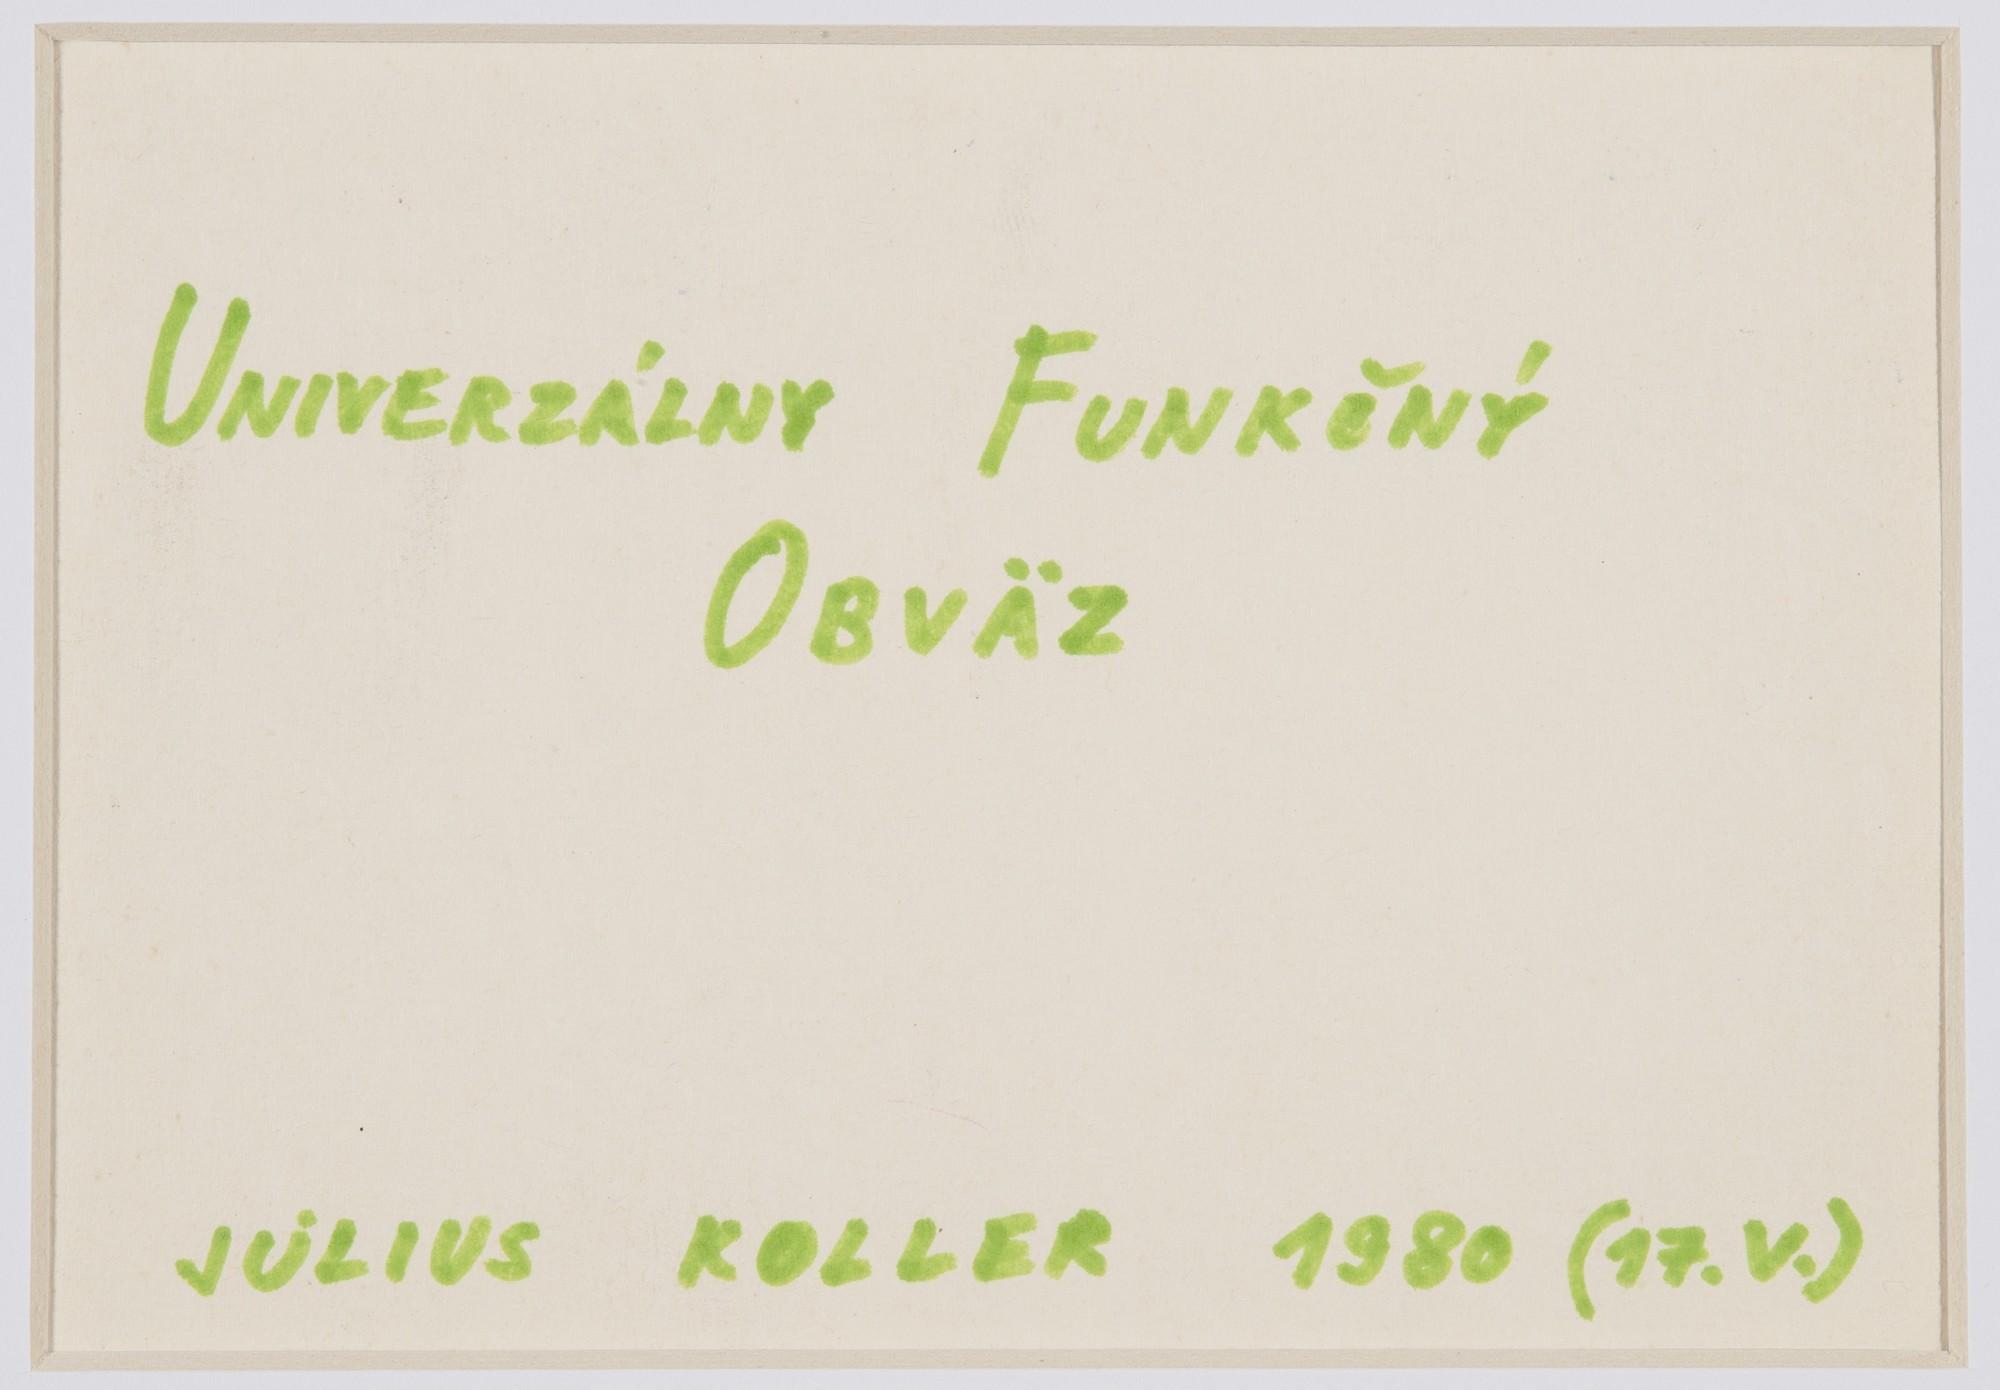 "<span class=""link fancybox-details-link""><a href=""/artists/155-julius-koller/works/10138/"">View Detail Page</a></span><div class=""artist""><span class=""artist""><strong>JULIUS KOLLER</strong></span></div><div class=""title""><em>Untitled (Univerzalny)</em>, 1980</div><div class=""medium"">Pen on paper</div><div class=""dimensions"">11 x 15.7 cm<br /> 4 3/8 x 6 1/8 in</div>"